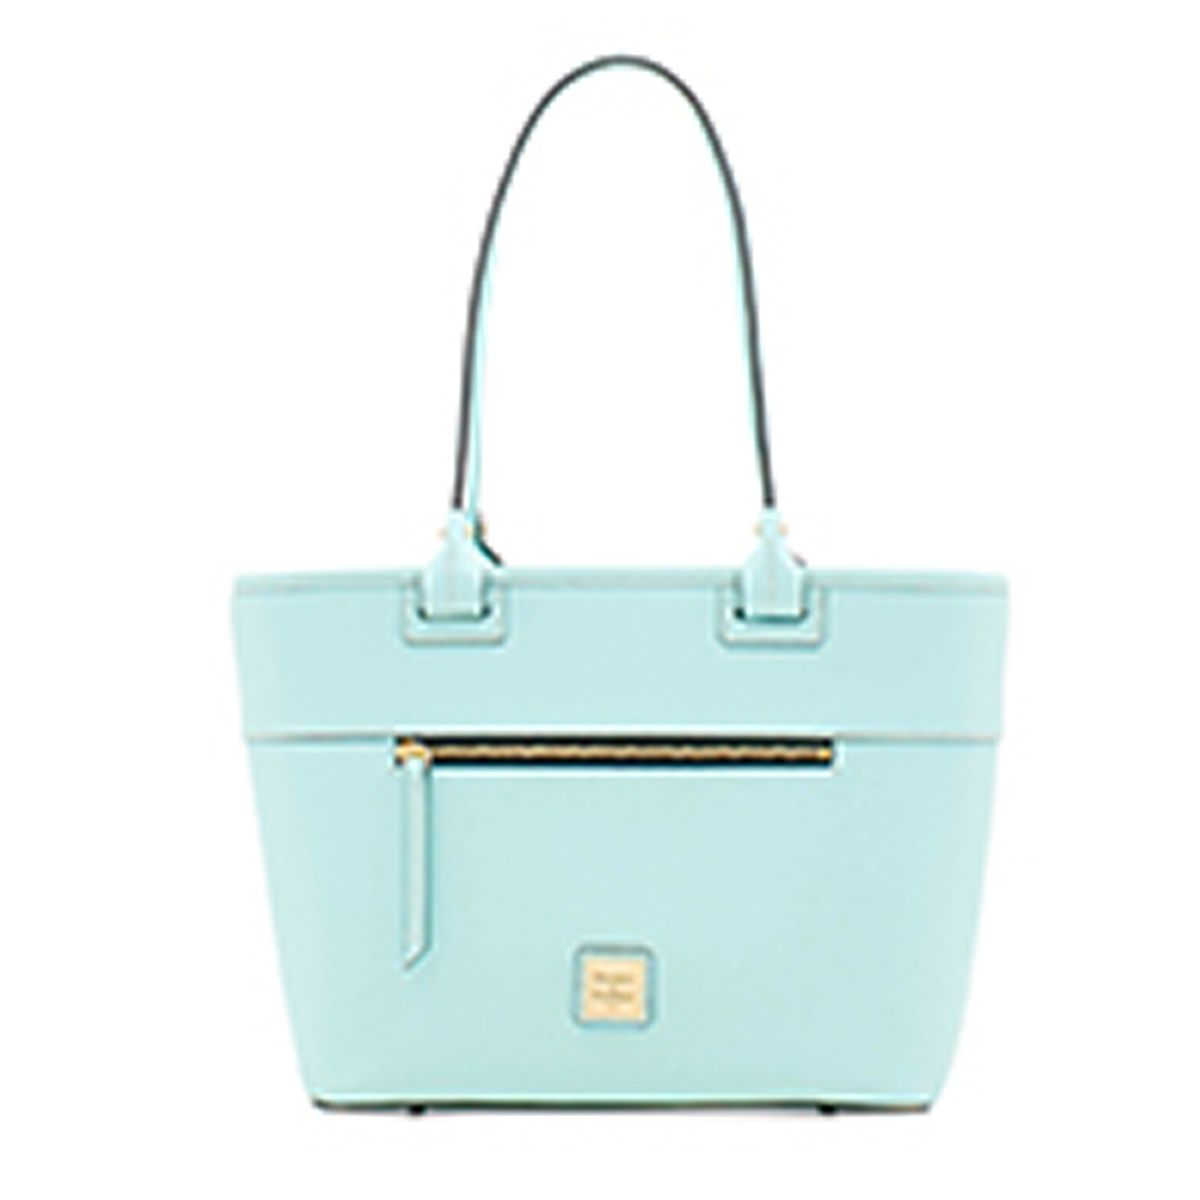 Designer Handbags - Macy s 1755adb8a15b5